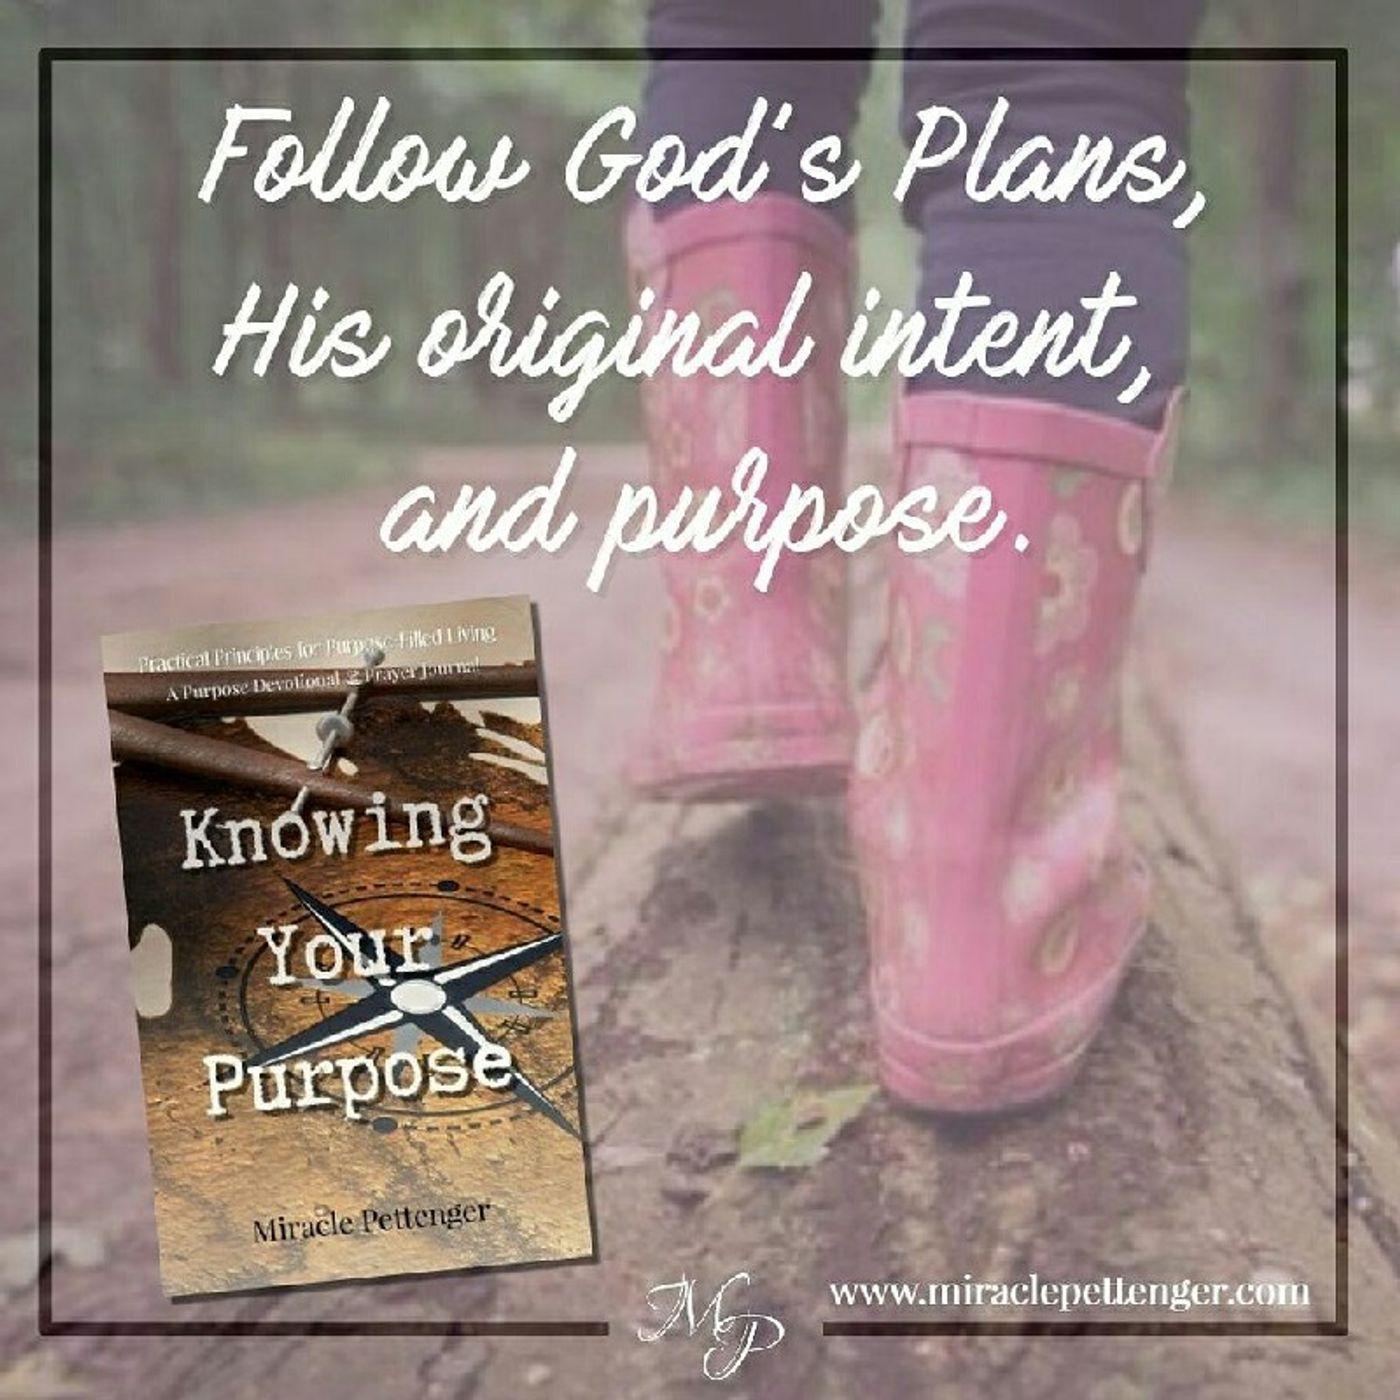 Follow God's Plans, Intent & Purpose